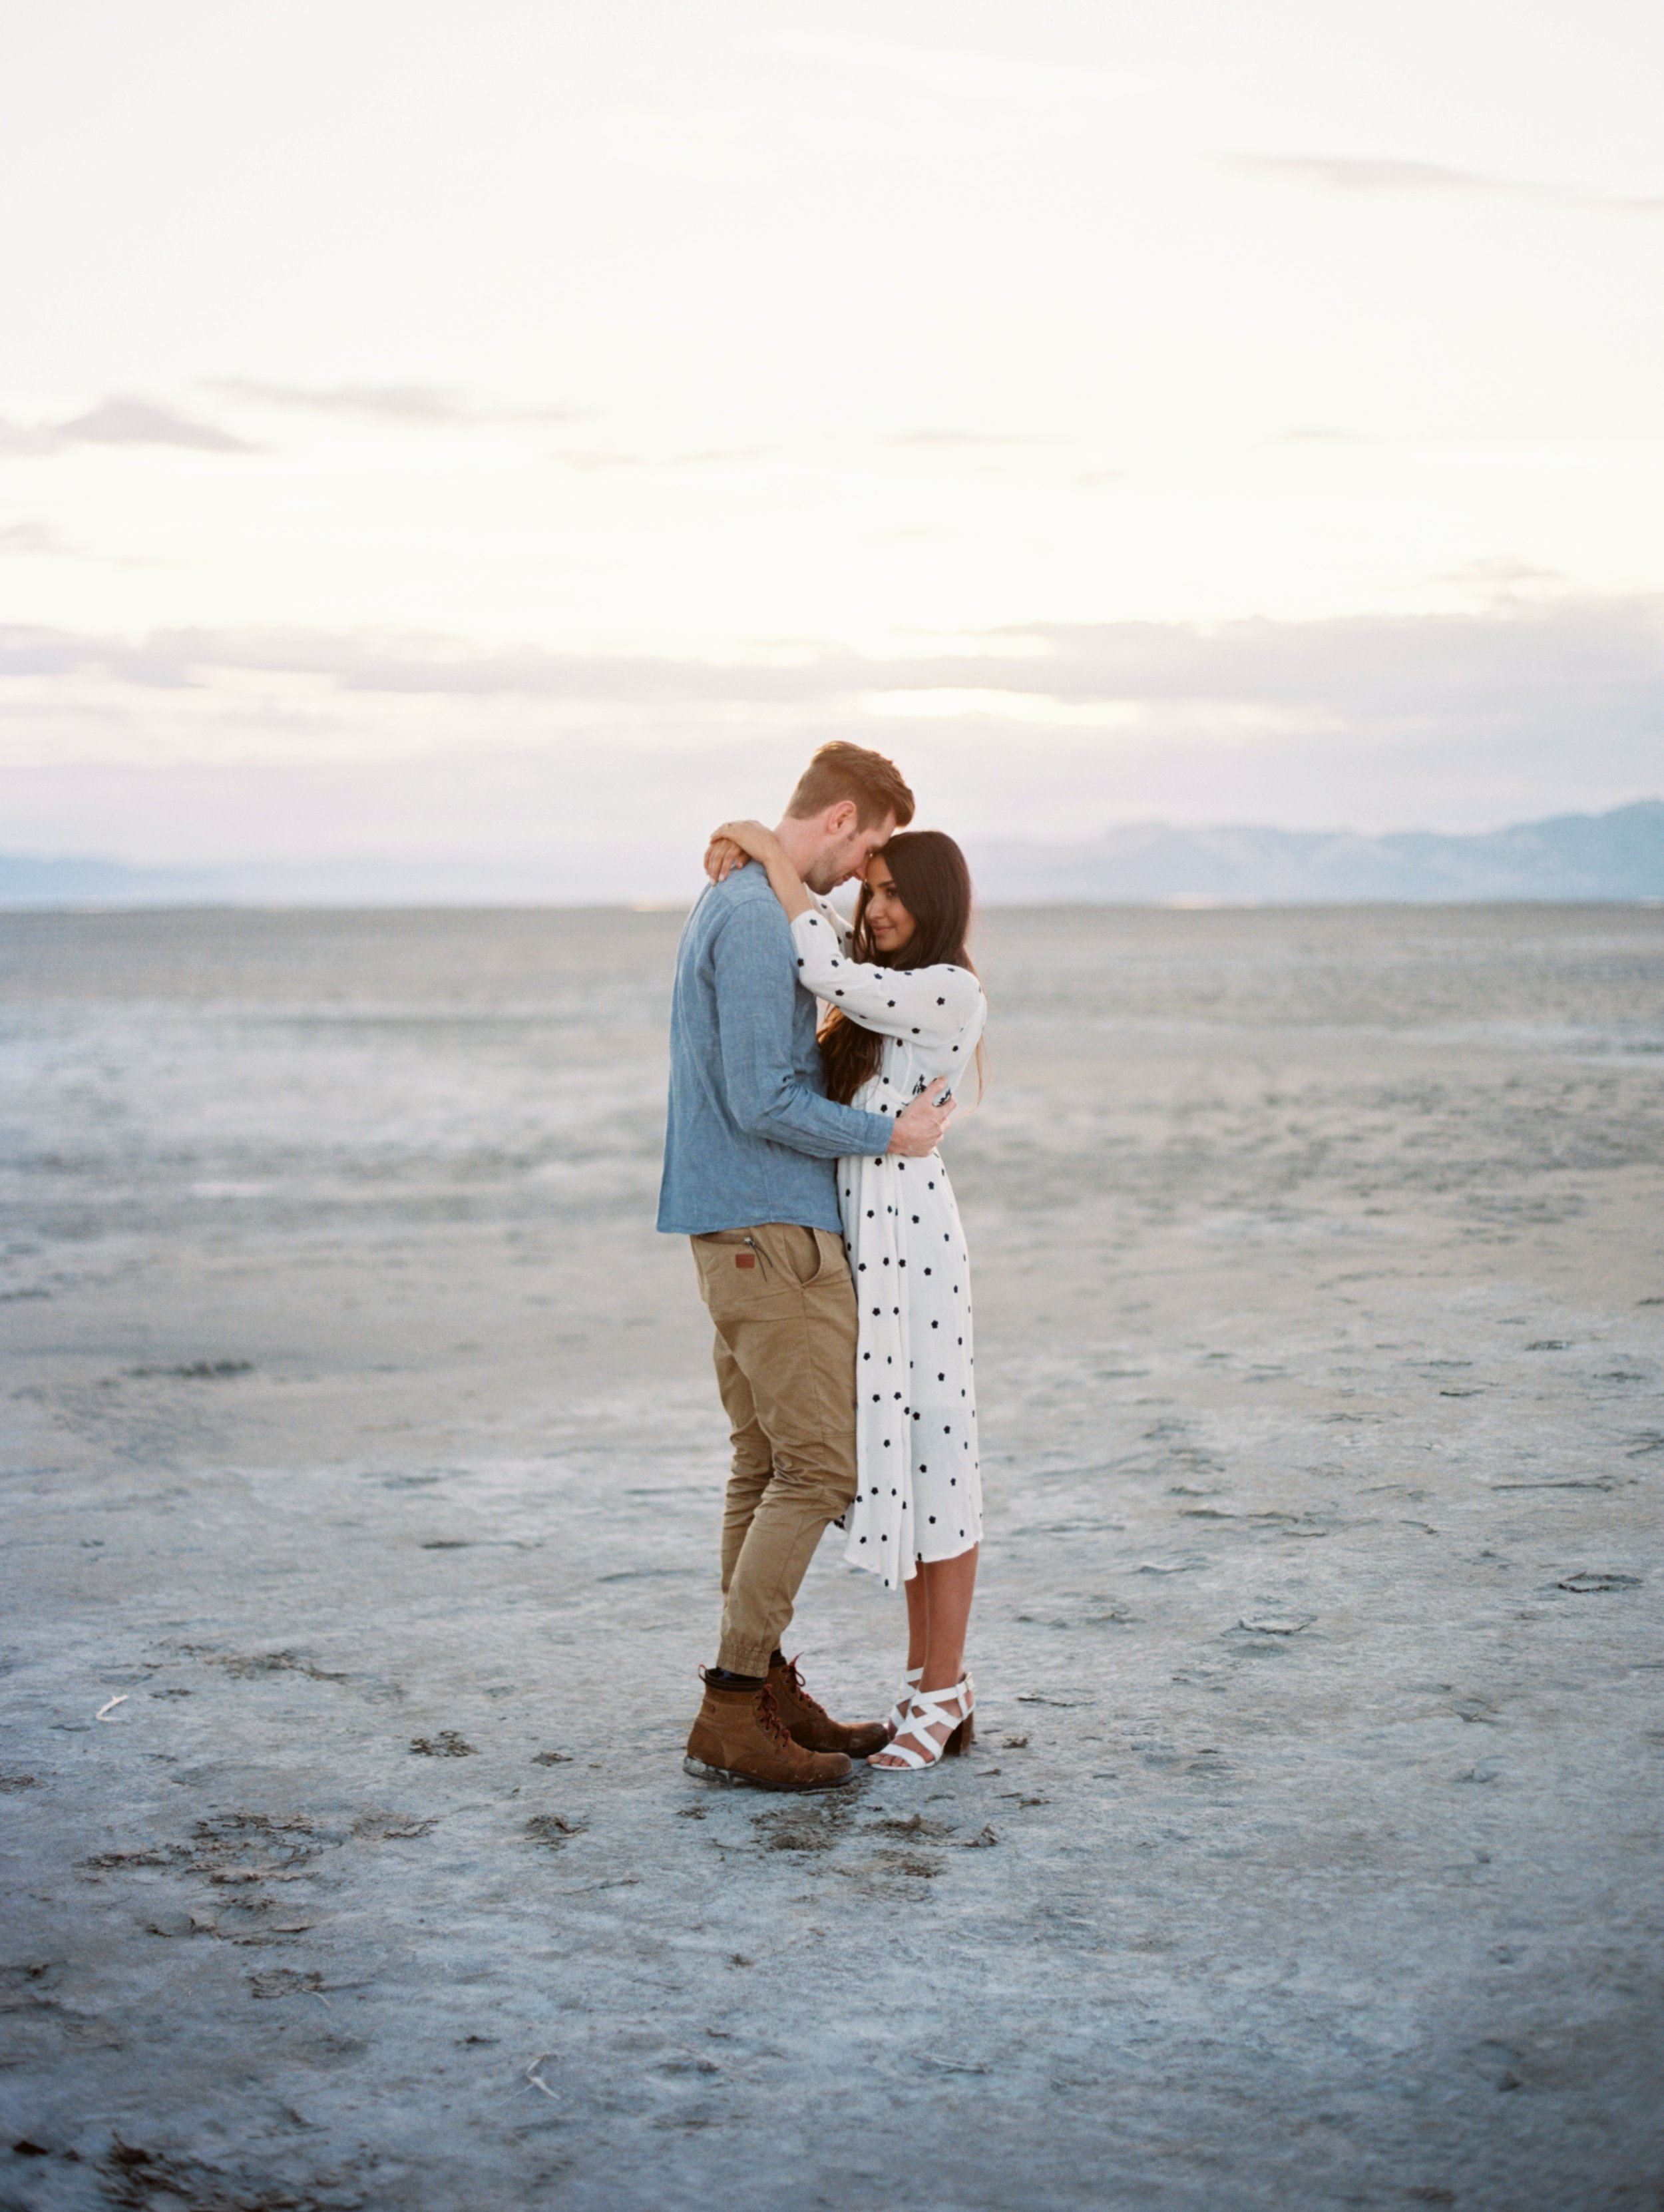 Kyle John l Fine Art Wedding Photography l Chicago, Copenhagen, California, New York, Destination l Blog l Michelle & Kyle_Salt Lake_22